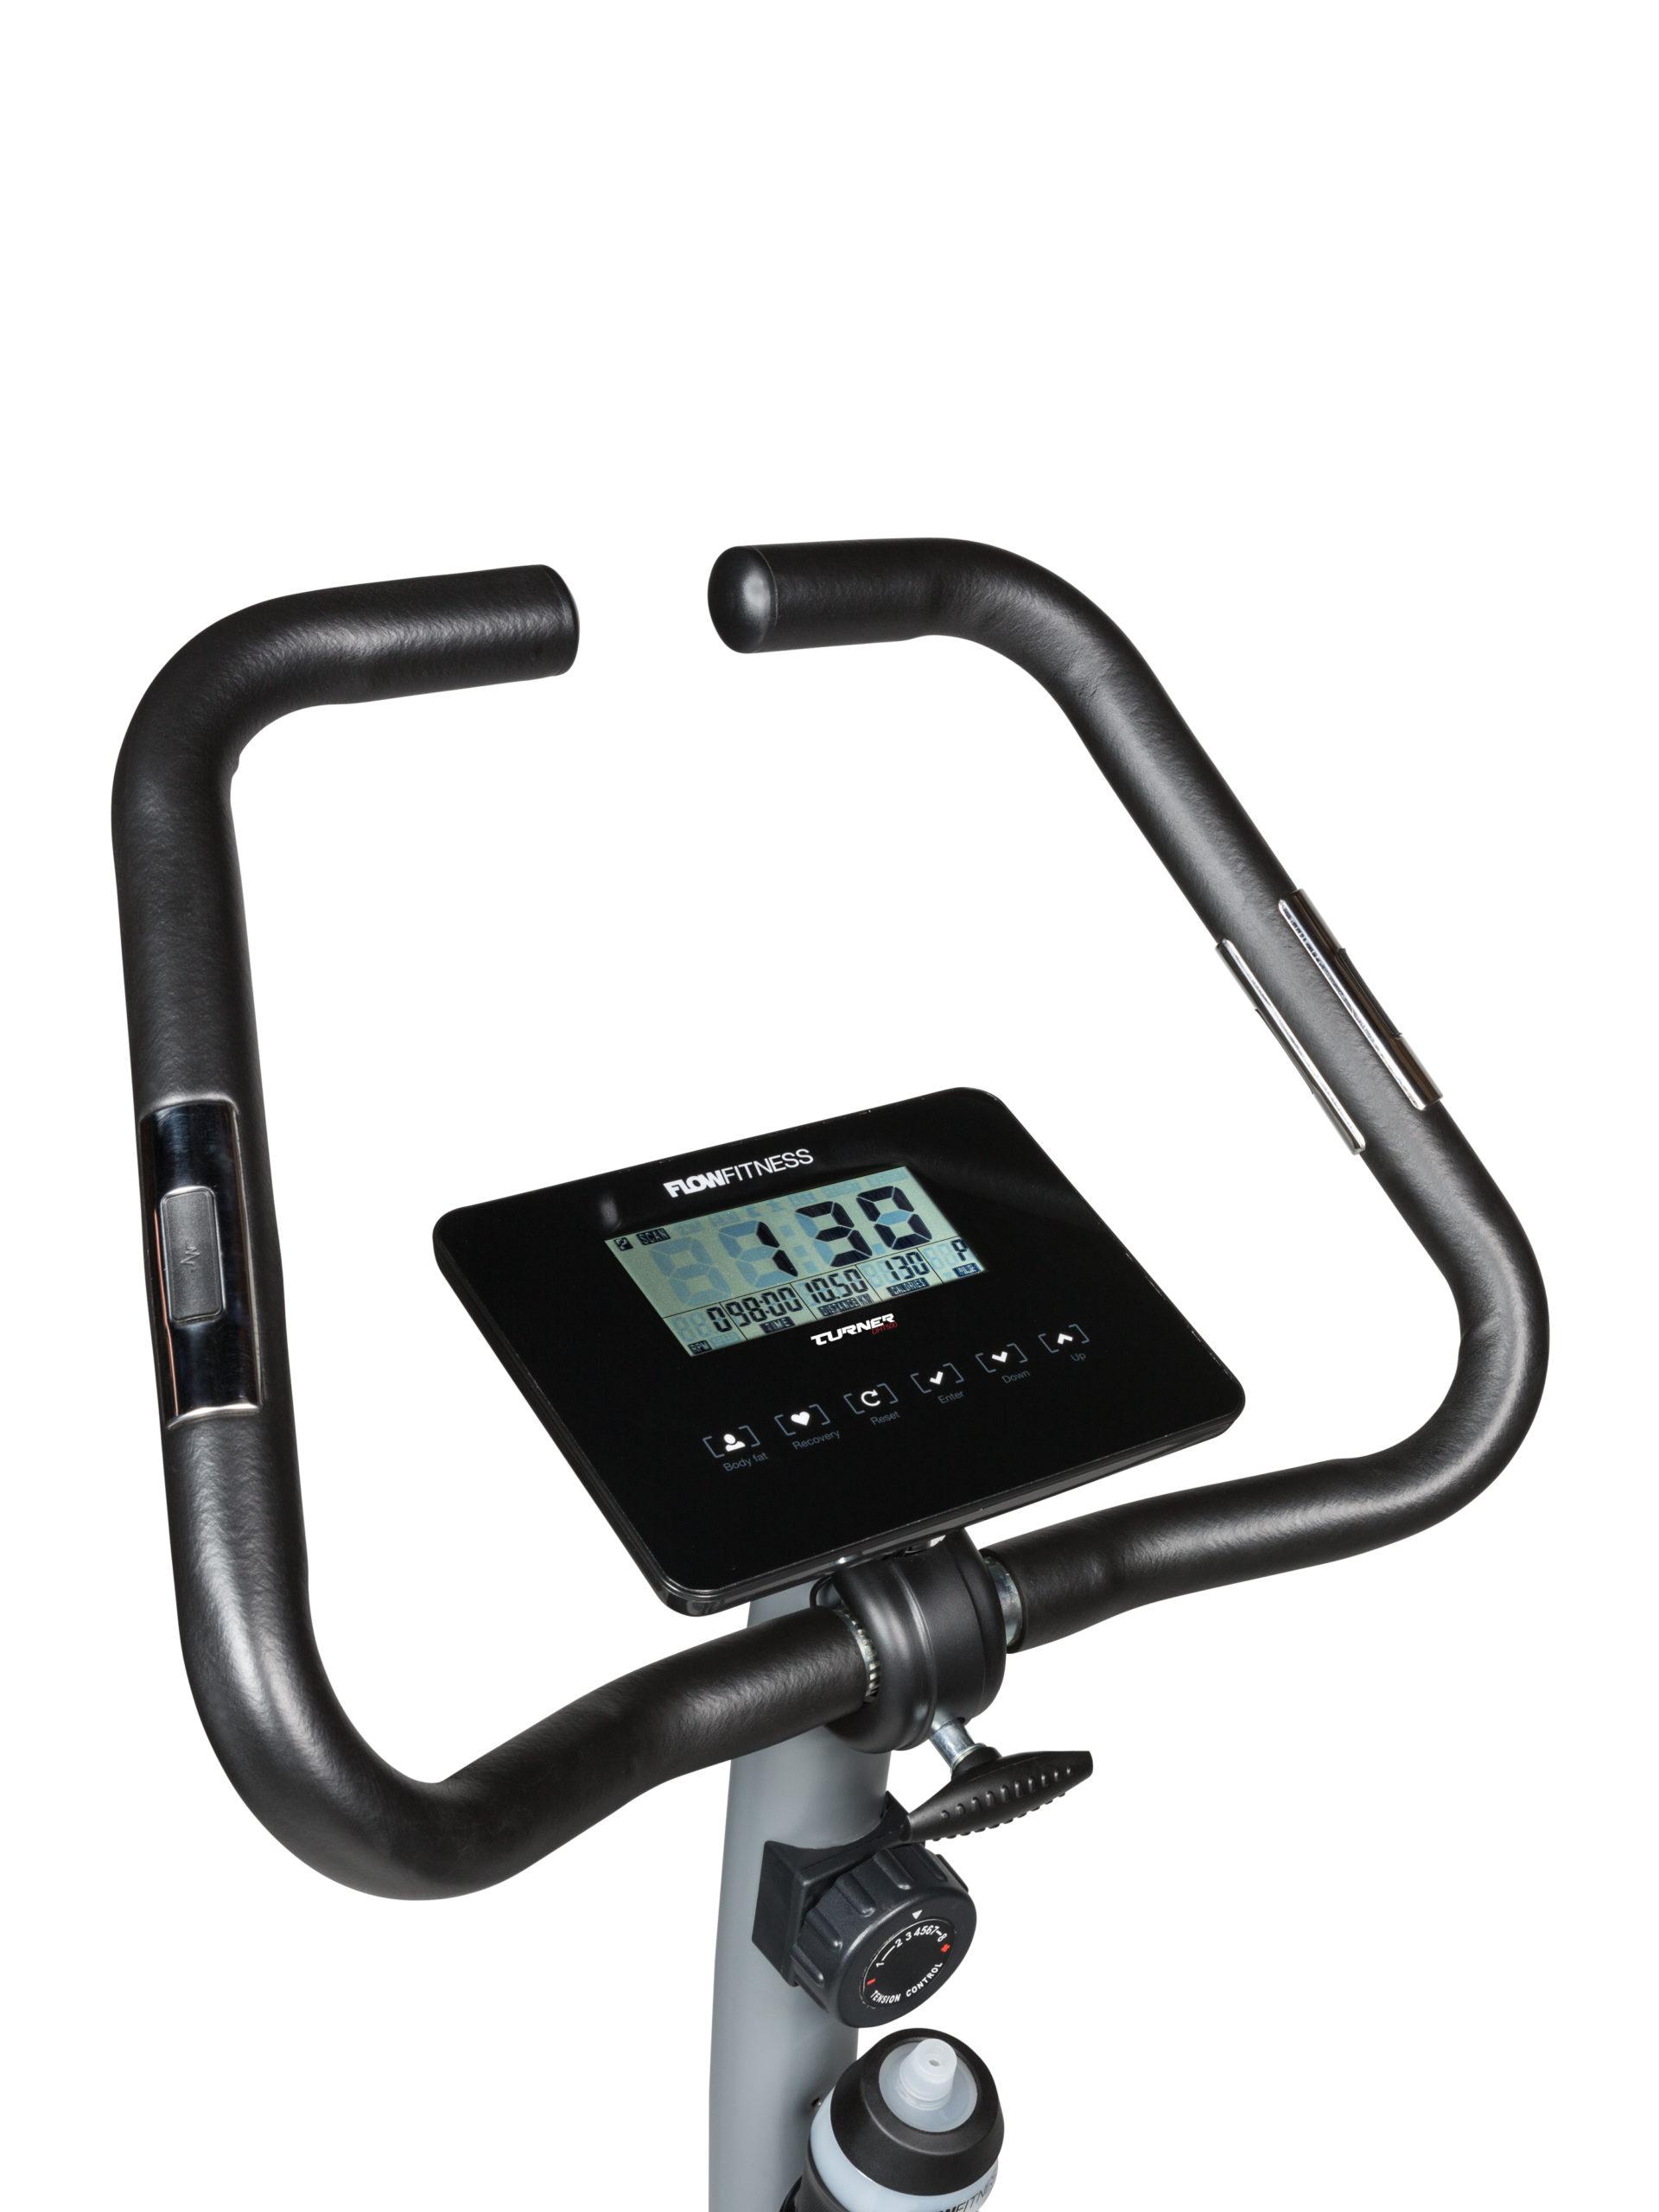 Flow Fitness Tabel Turner DHT500 Hometrainer 4